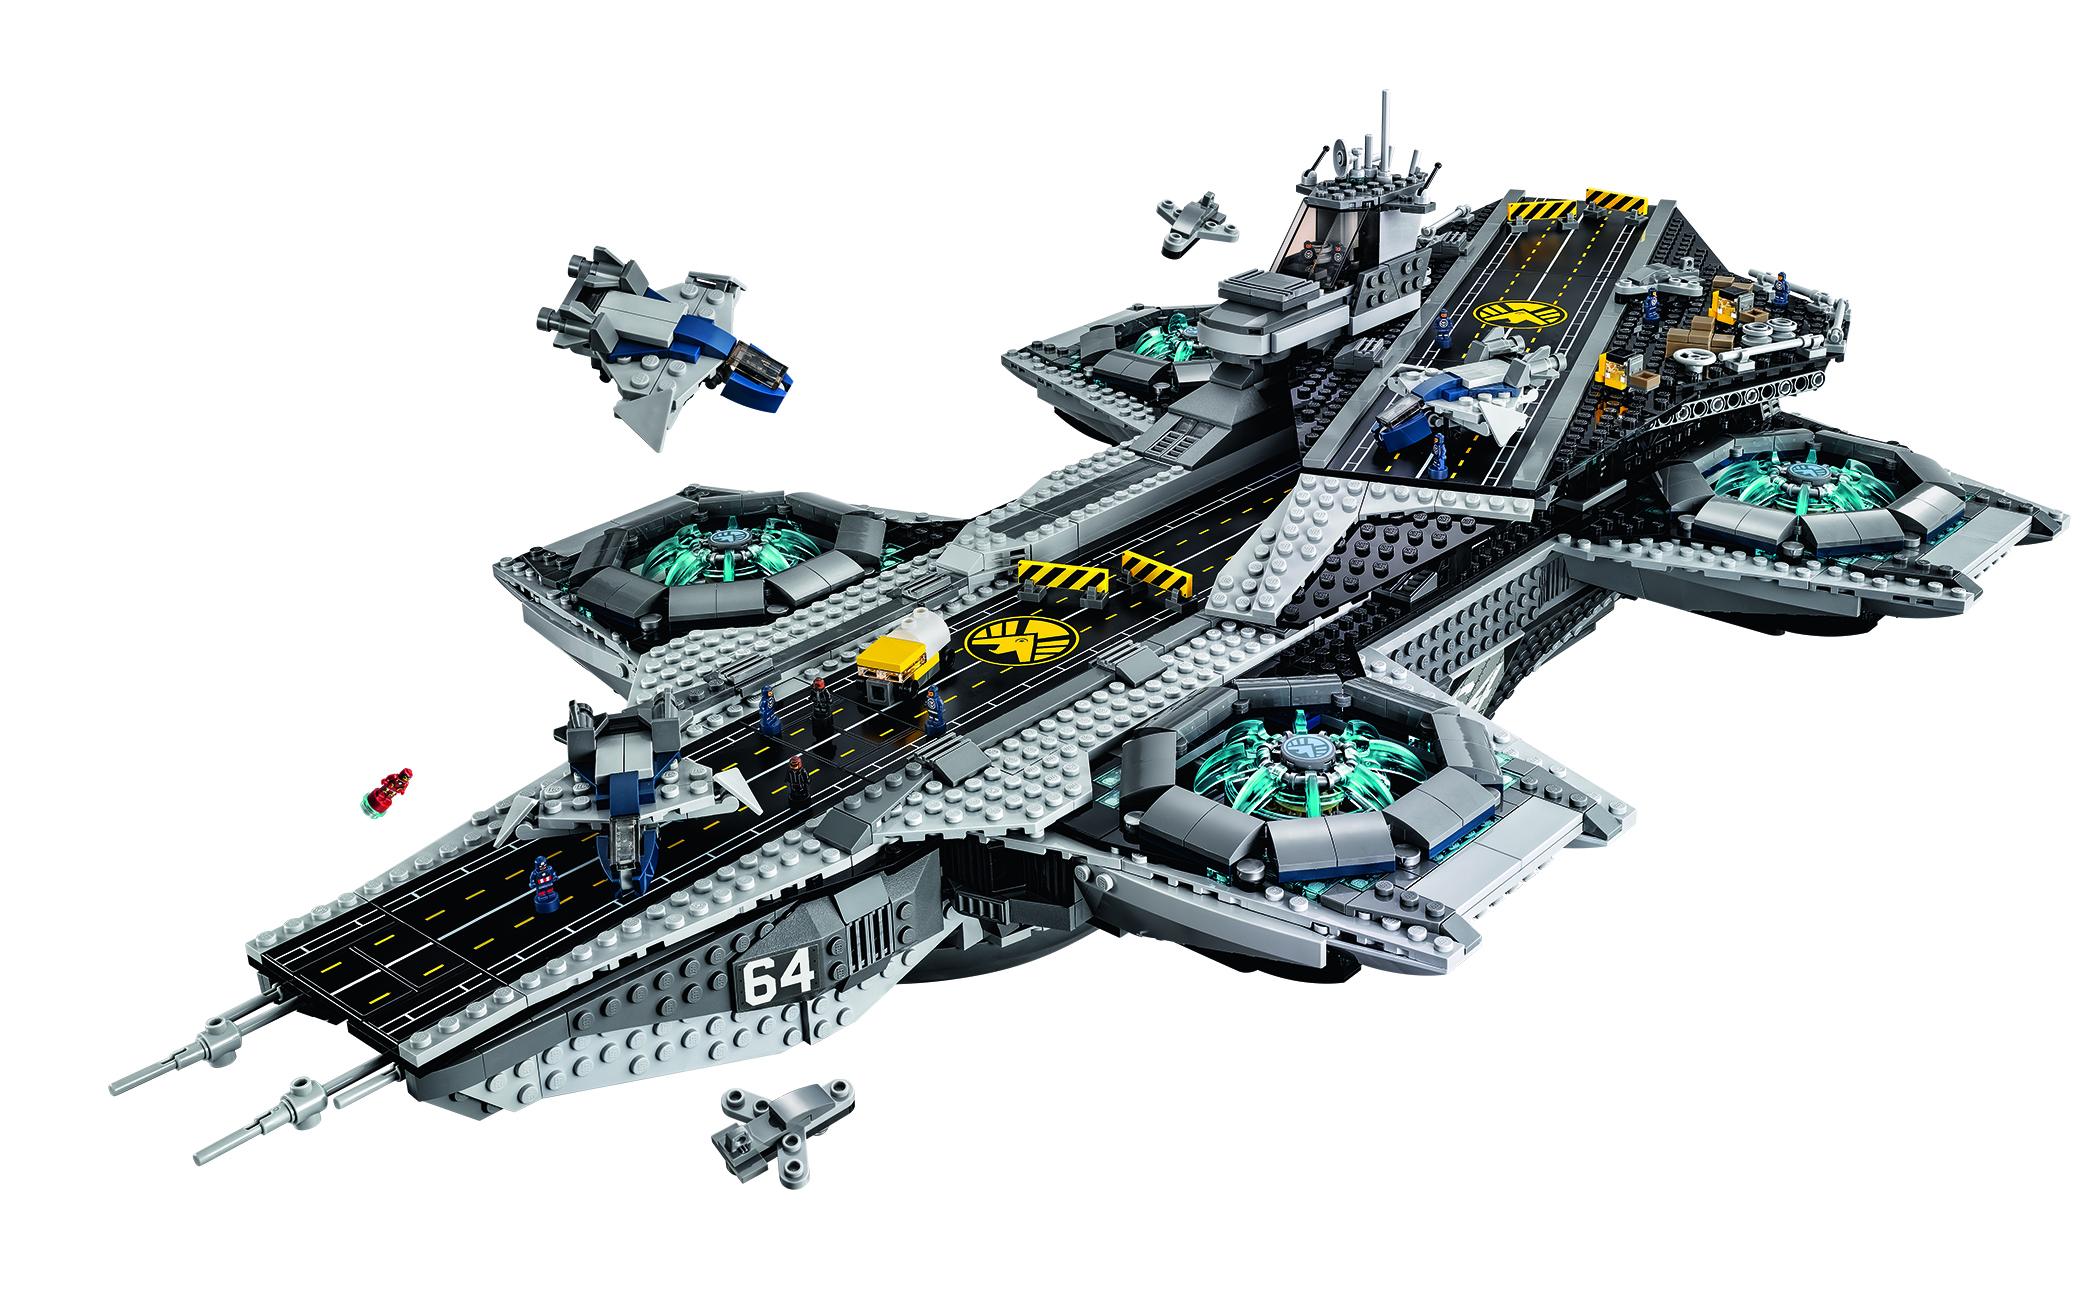 It's official – We're getting a LEGO UCS S.H.I.E.L.D ...